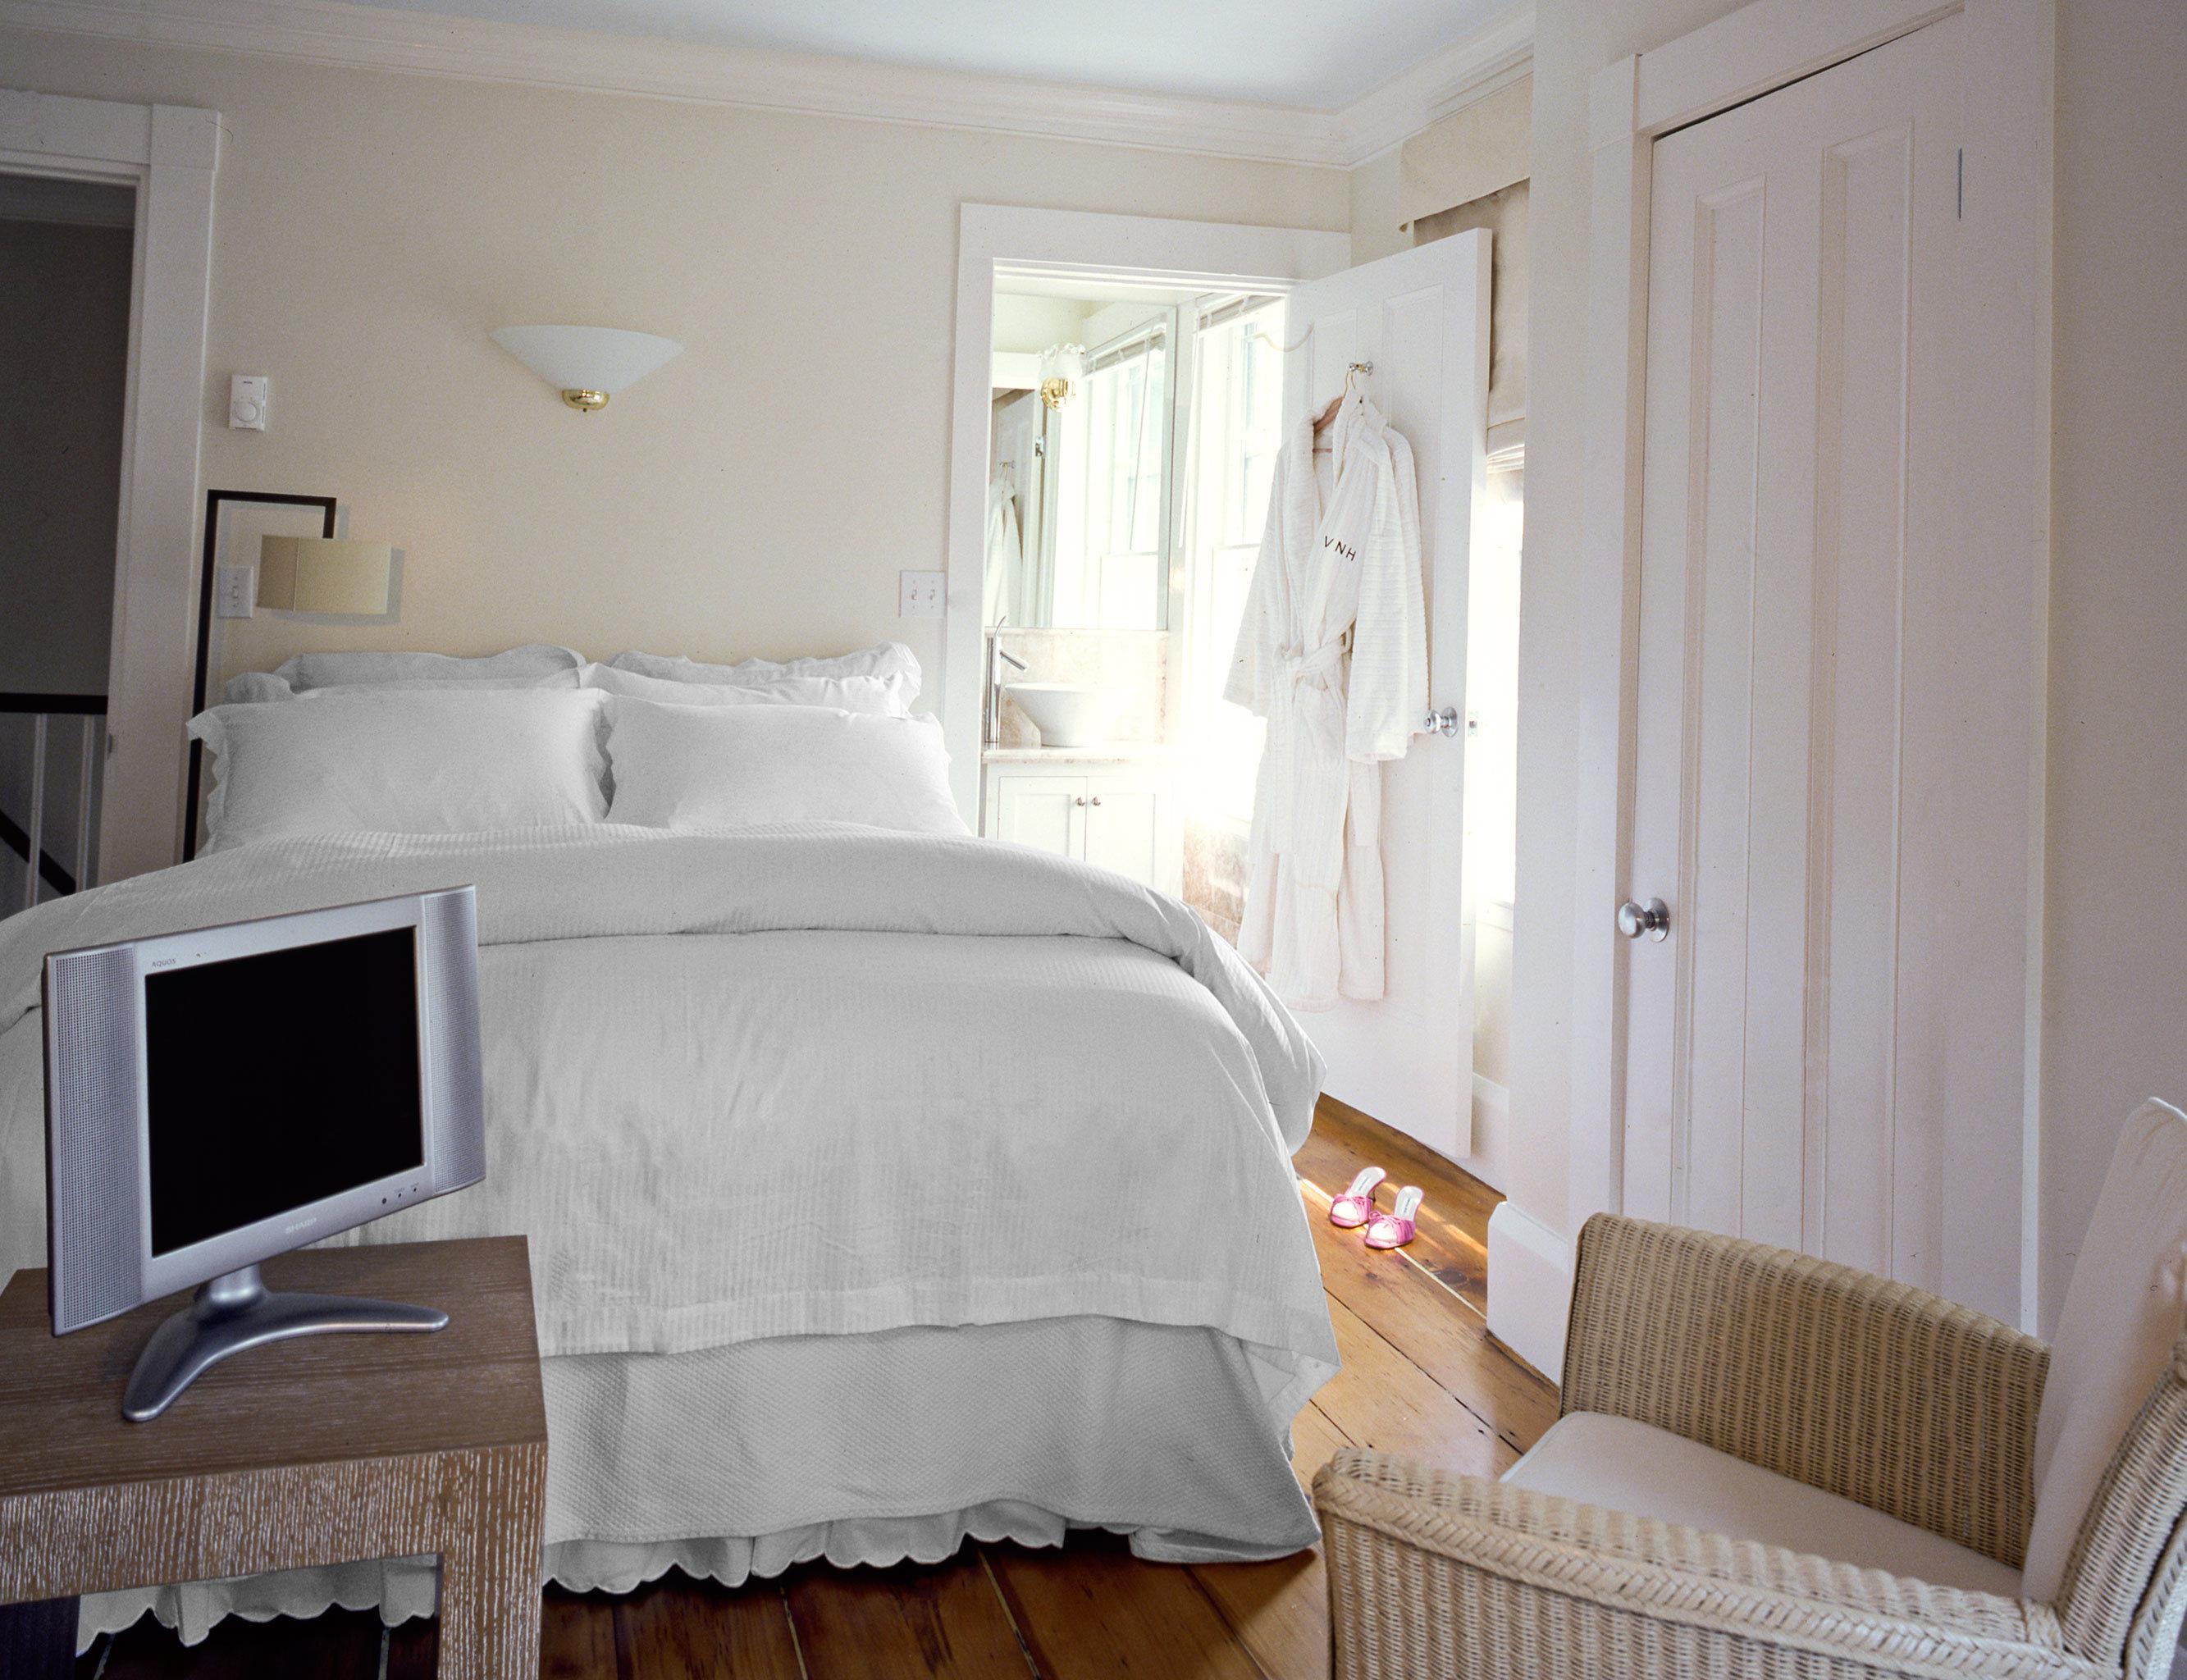 Bedroom Boutique Budget sofa property cottage home Suite